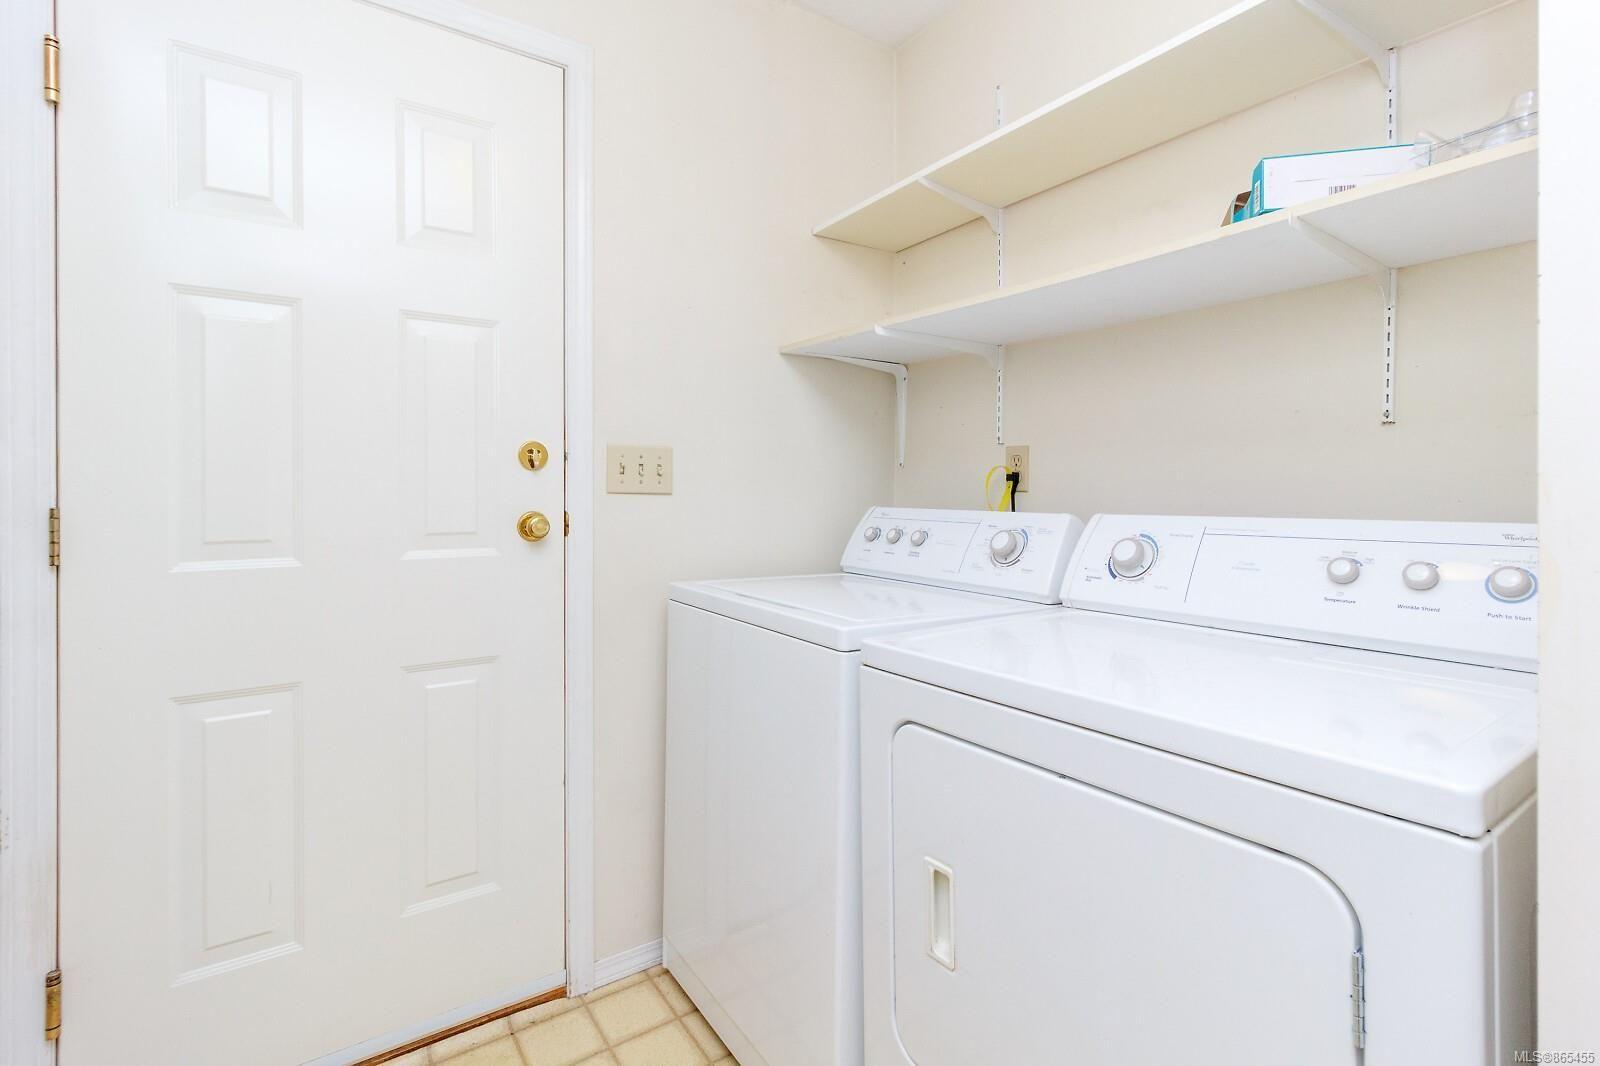 Photo 22: Photos: 399 Beech Ave in : Du East Duncan House for sale (Duncan)  : MLS®# 865455